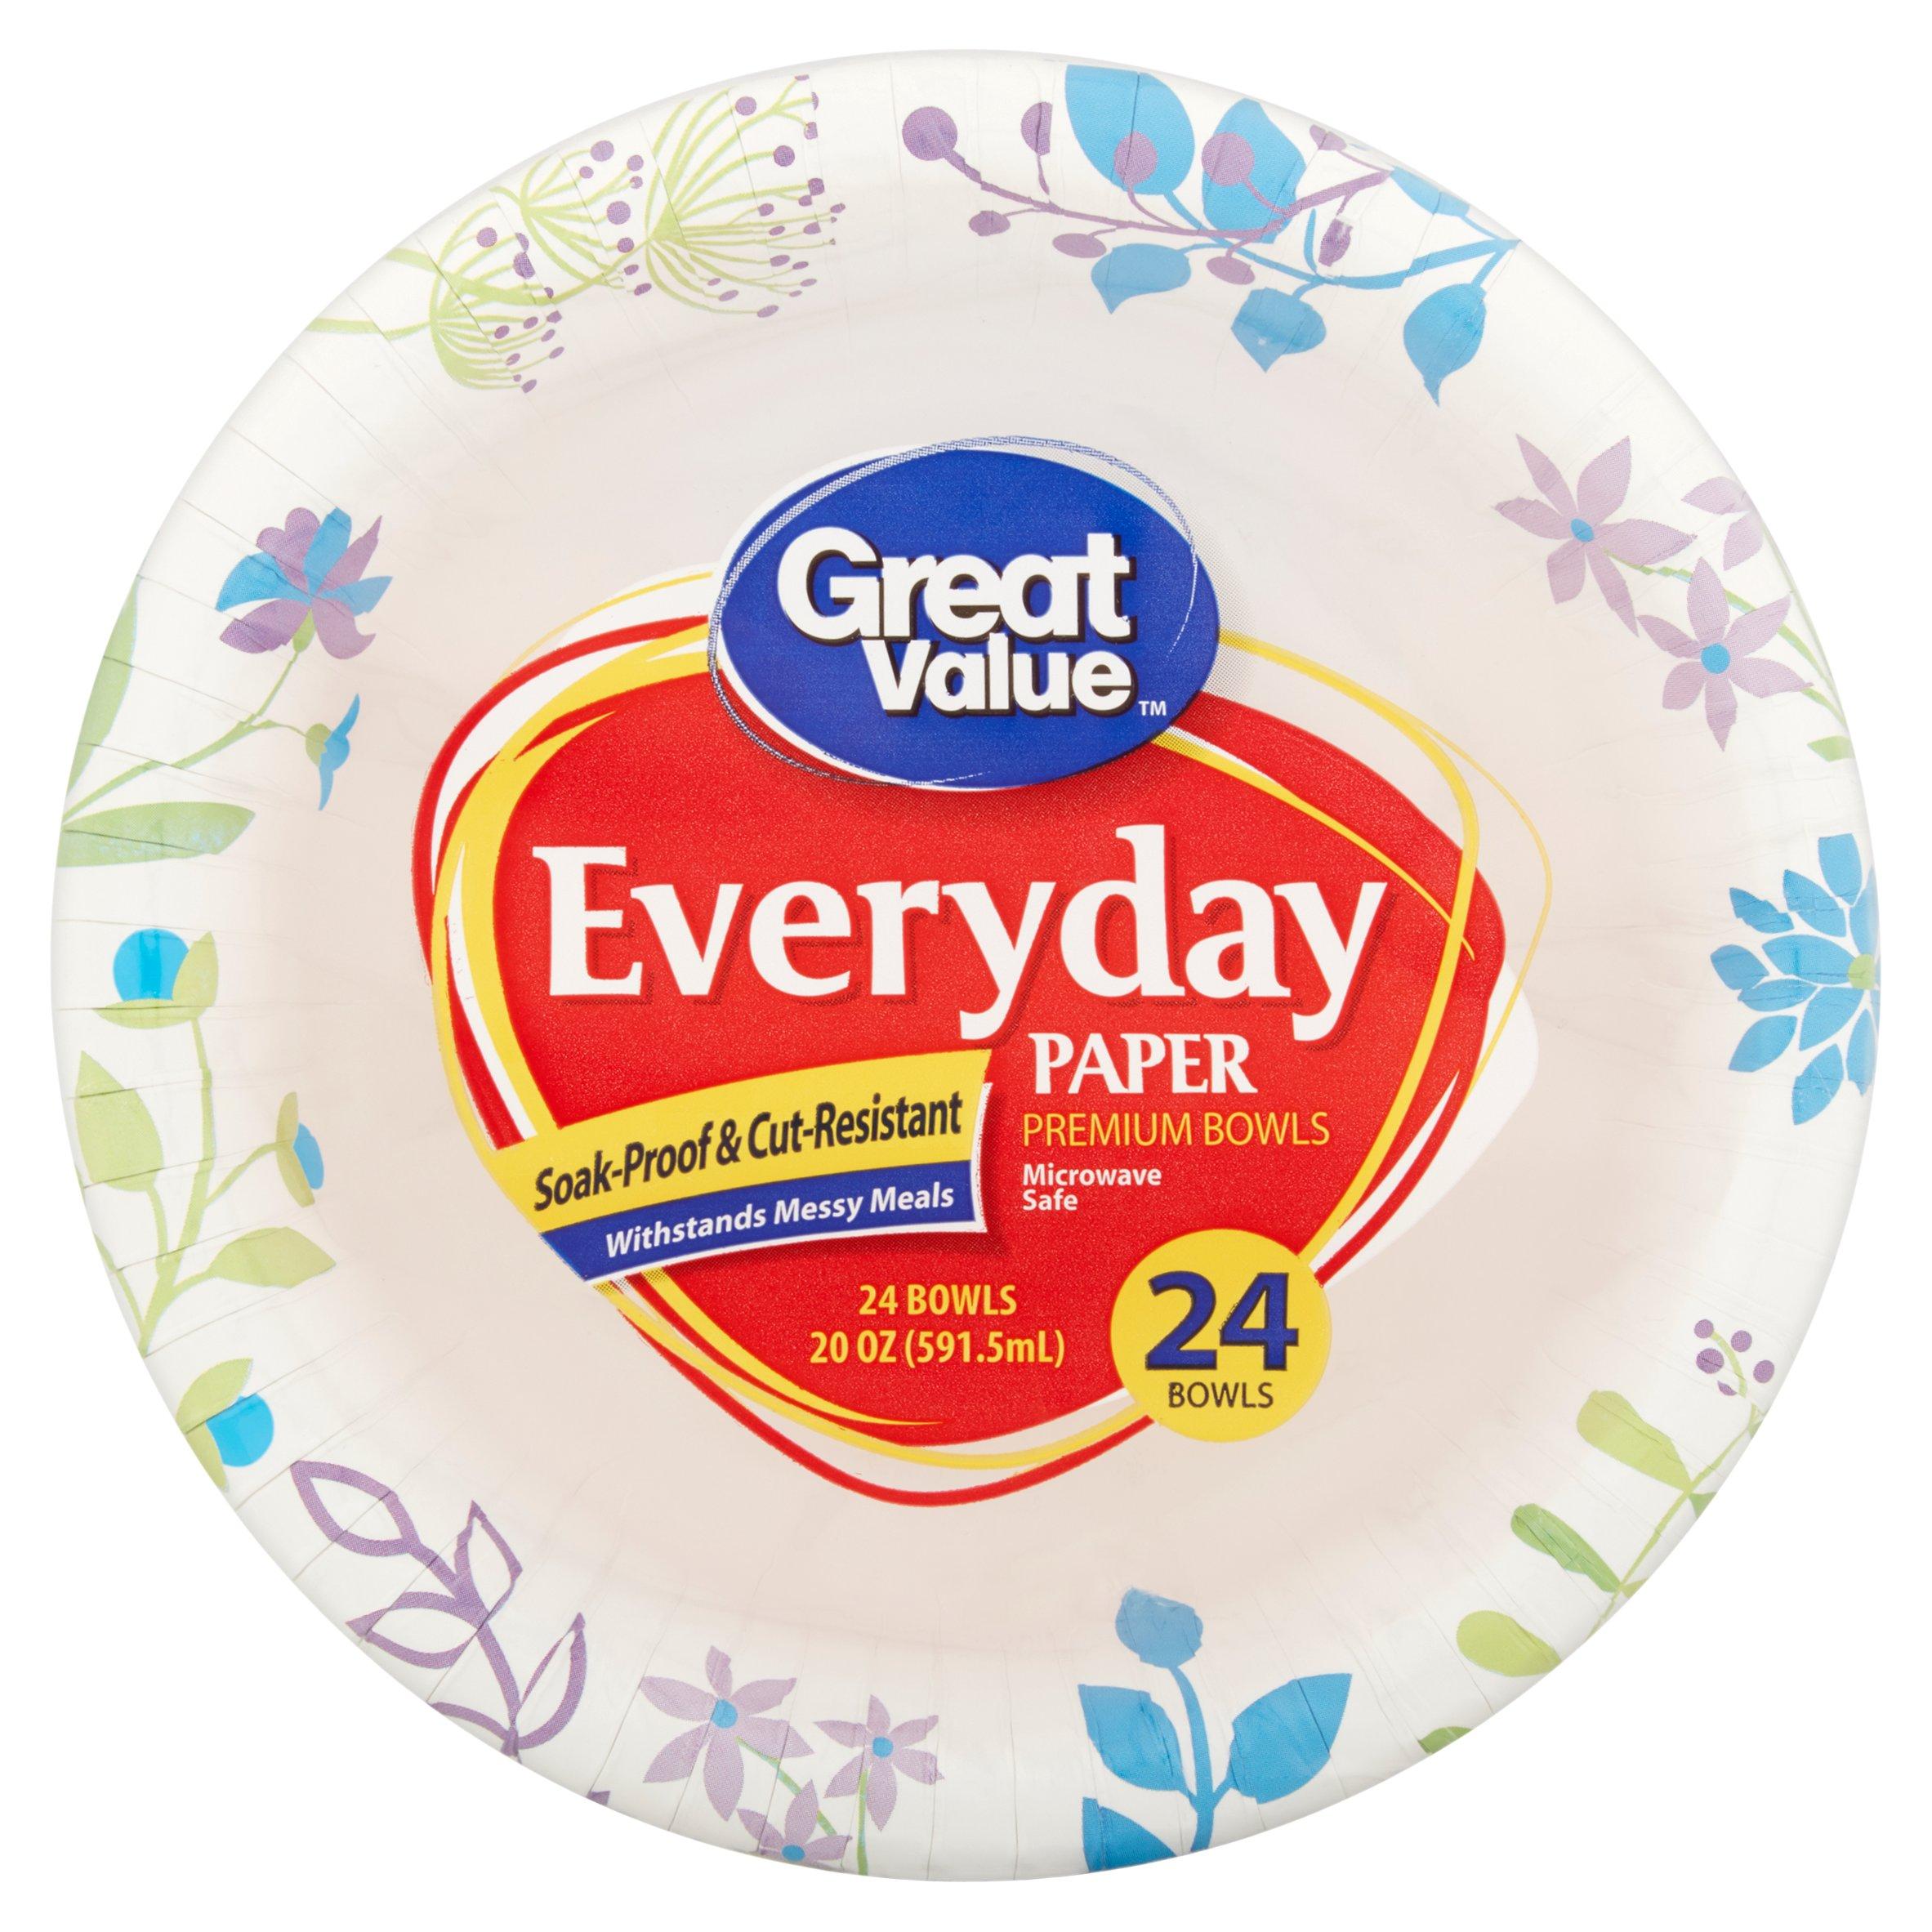 Great Value Ultra Maximum Strength 20 oz Paper Bowls, 24 ct